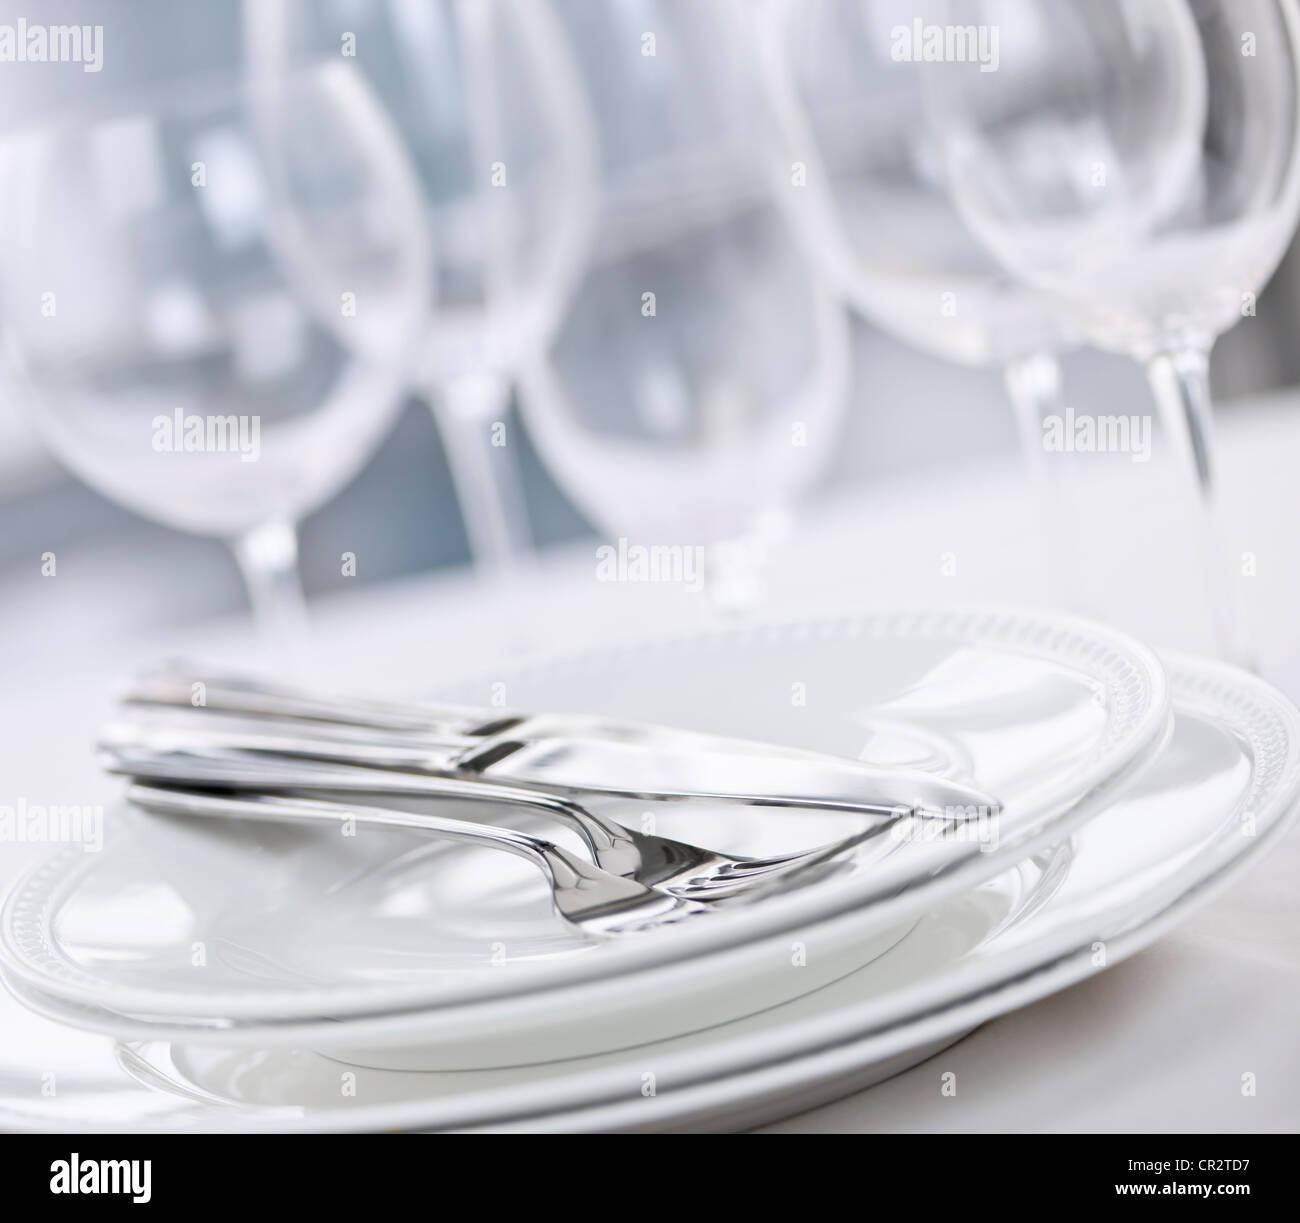 Elegant restaurant table setting with plates cutlery and stemware & Elegant restaurant table setting with plates cutlery and stemware ...